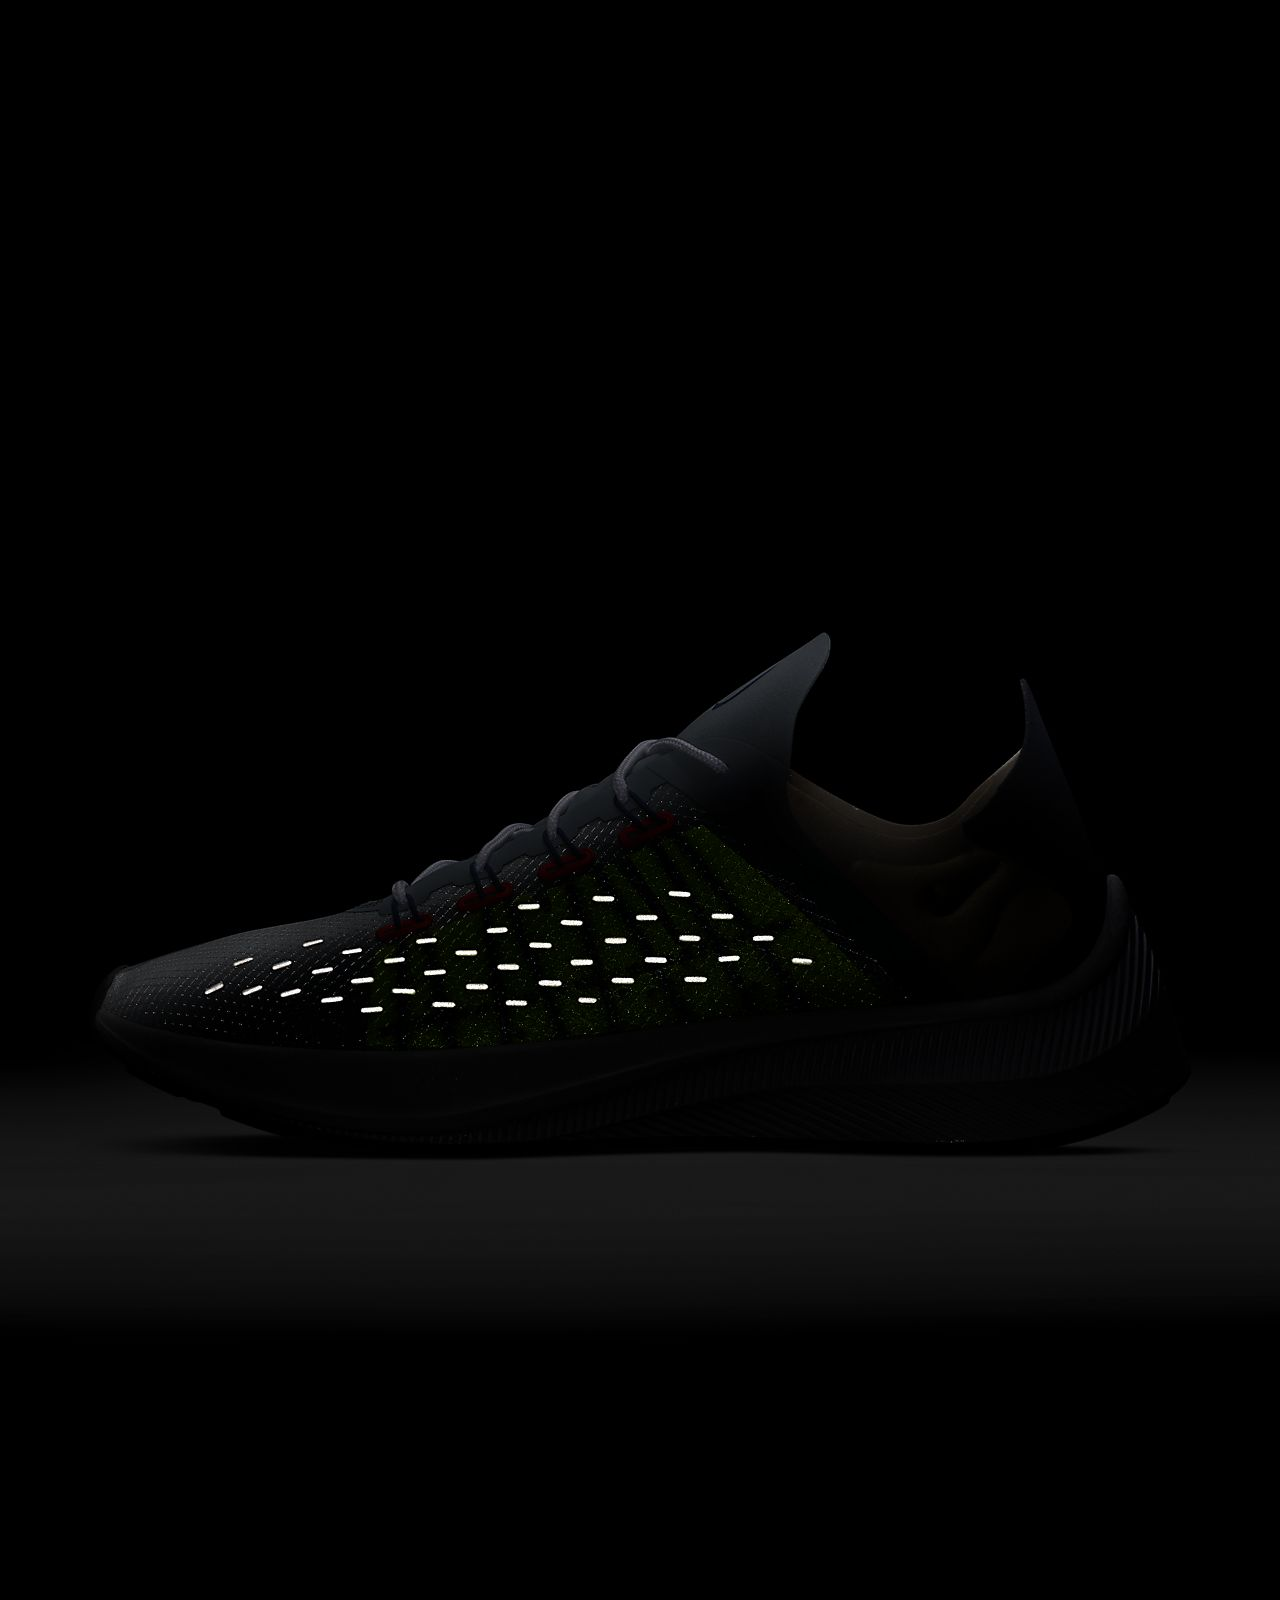 designer fashion 0aee5 274f7 ... Nike EXP-X14 Men s Shoe